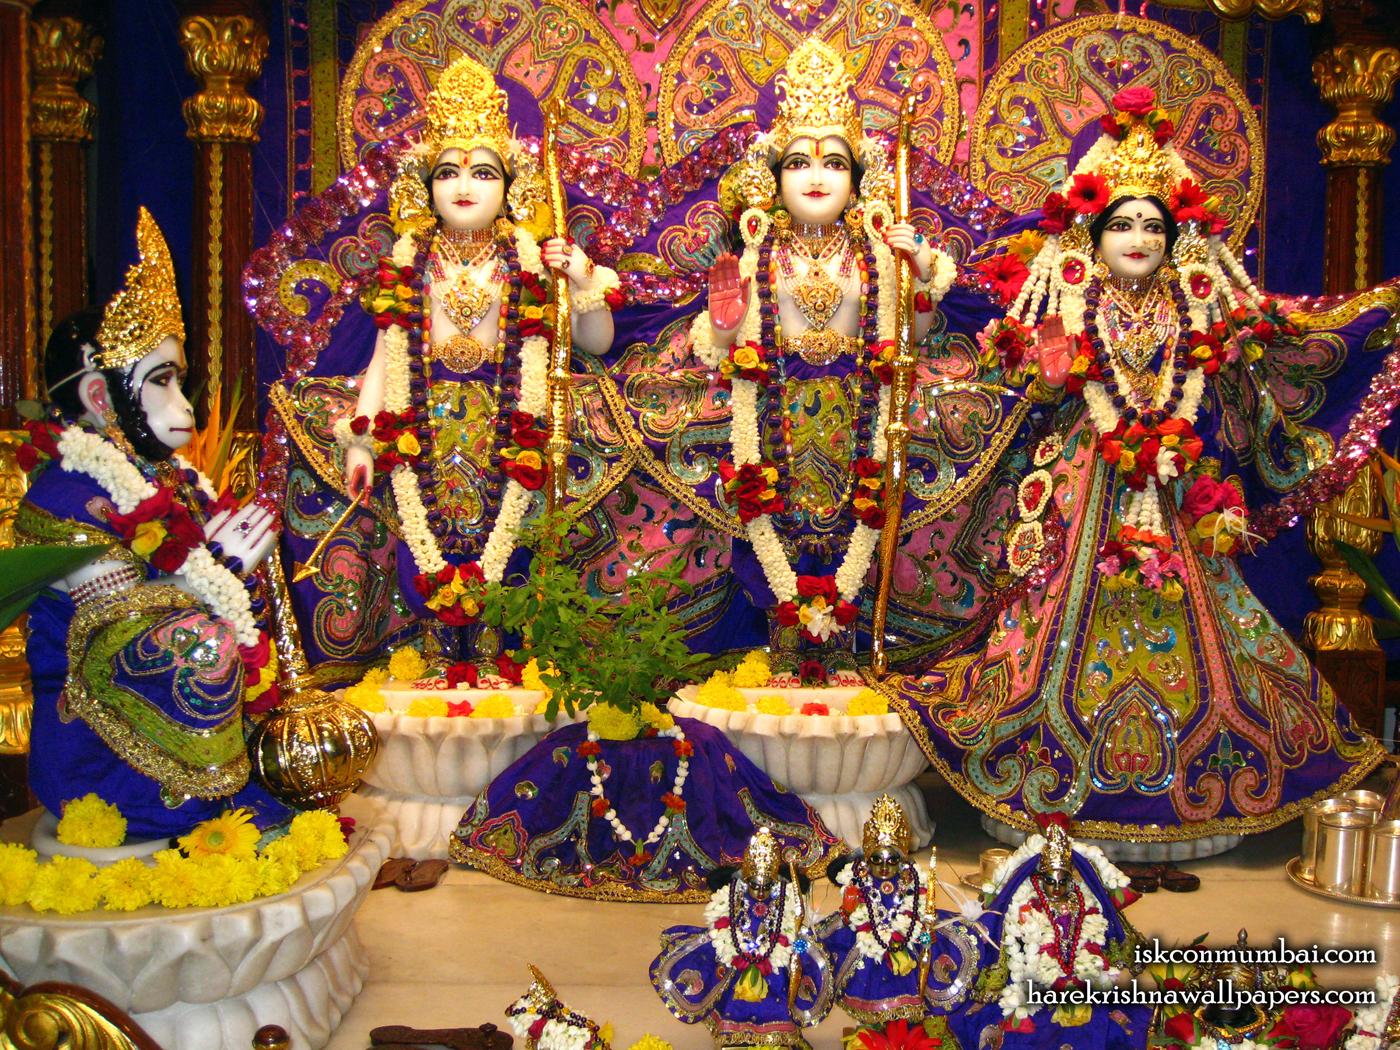 Sri Sri Sita Rama Laxman Hanuman Wallpaper (001) Size 1400x1050 Download